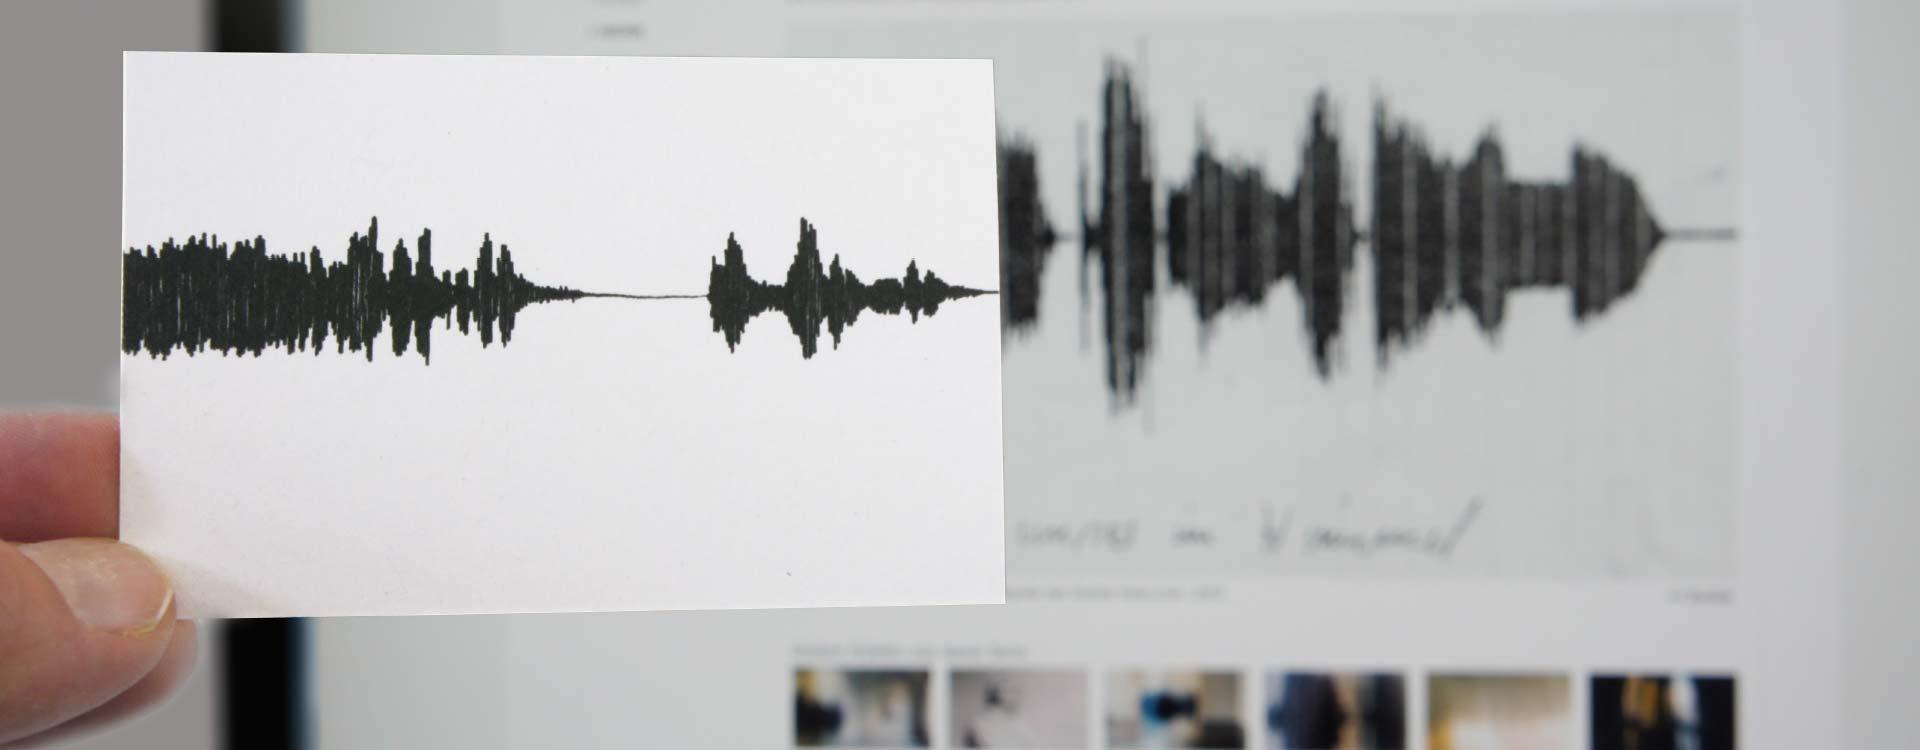 Business card for Sigrun Drapatz; Design: Kattrin Richter | Graphic Design Studio